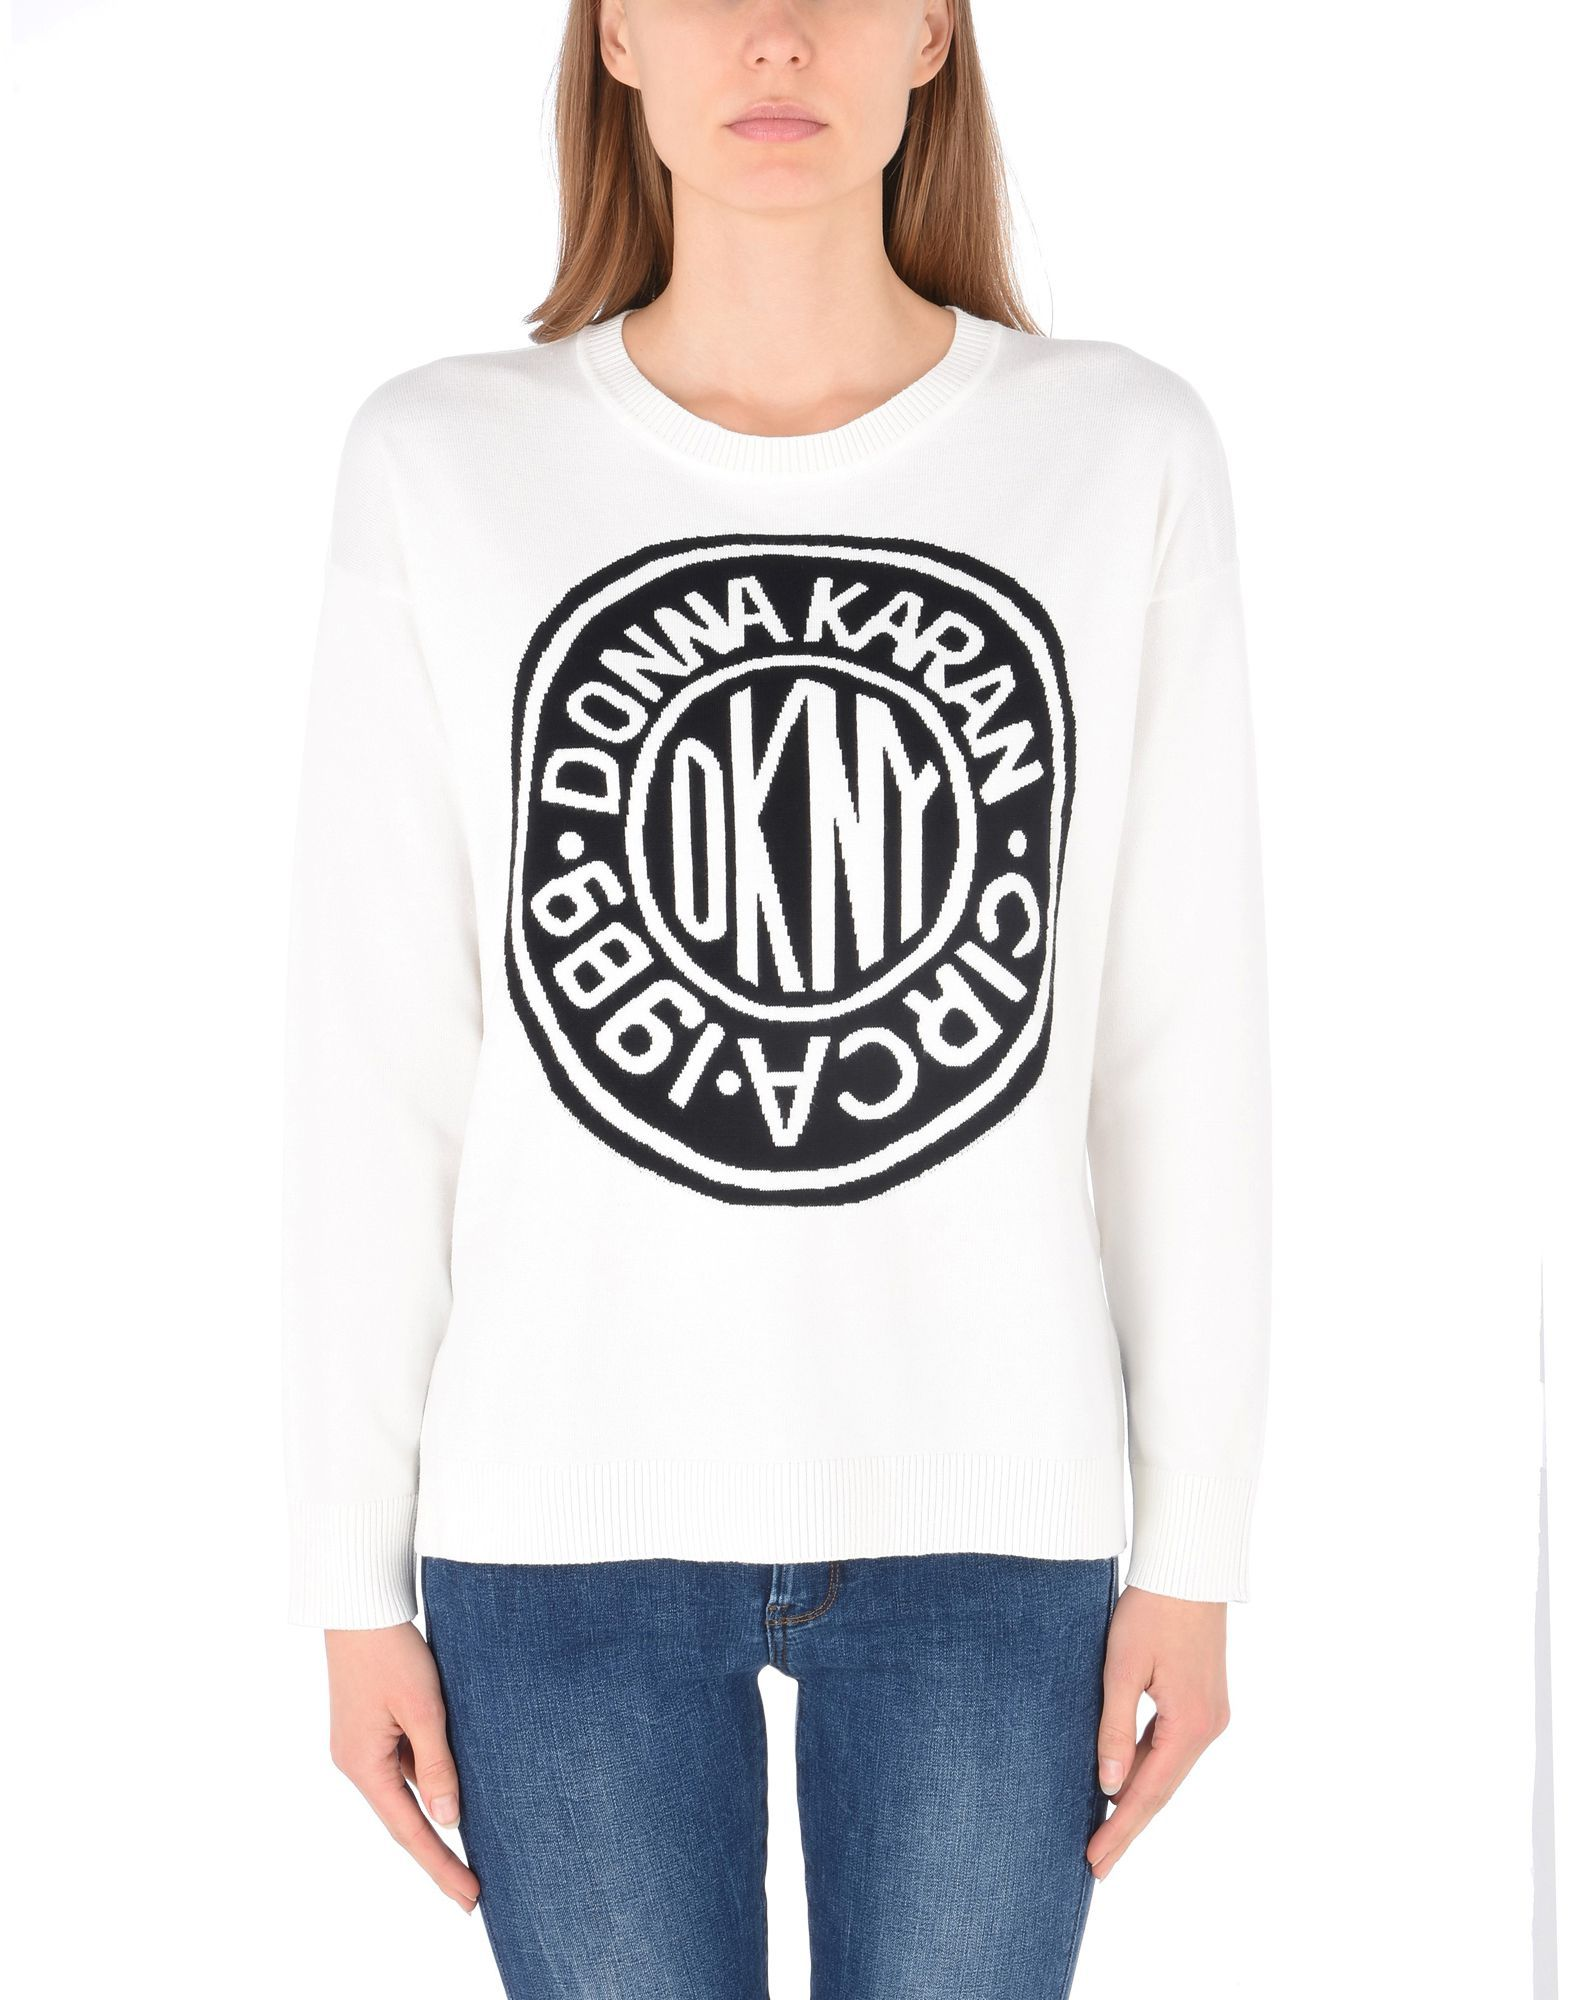 DKNY White Logo Print Jumper